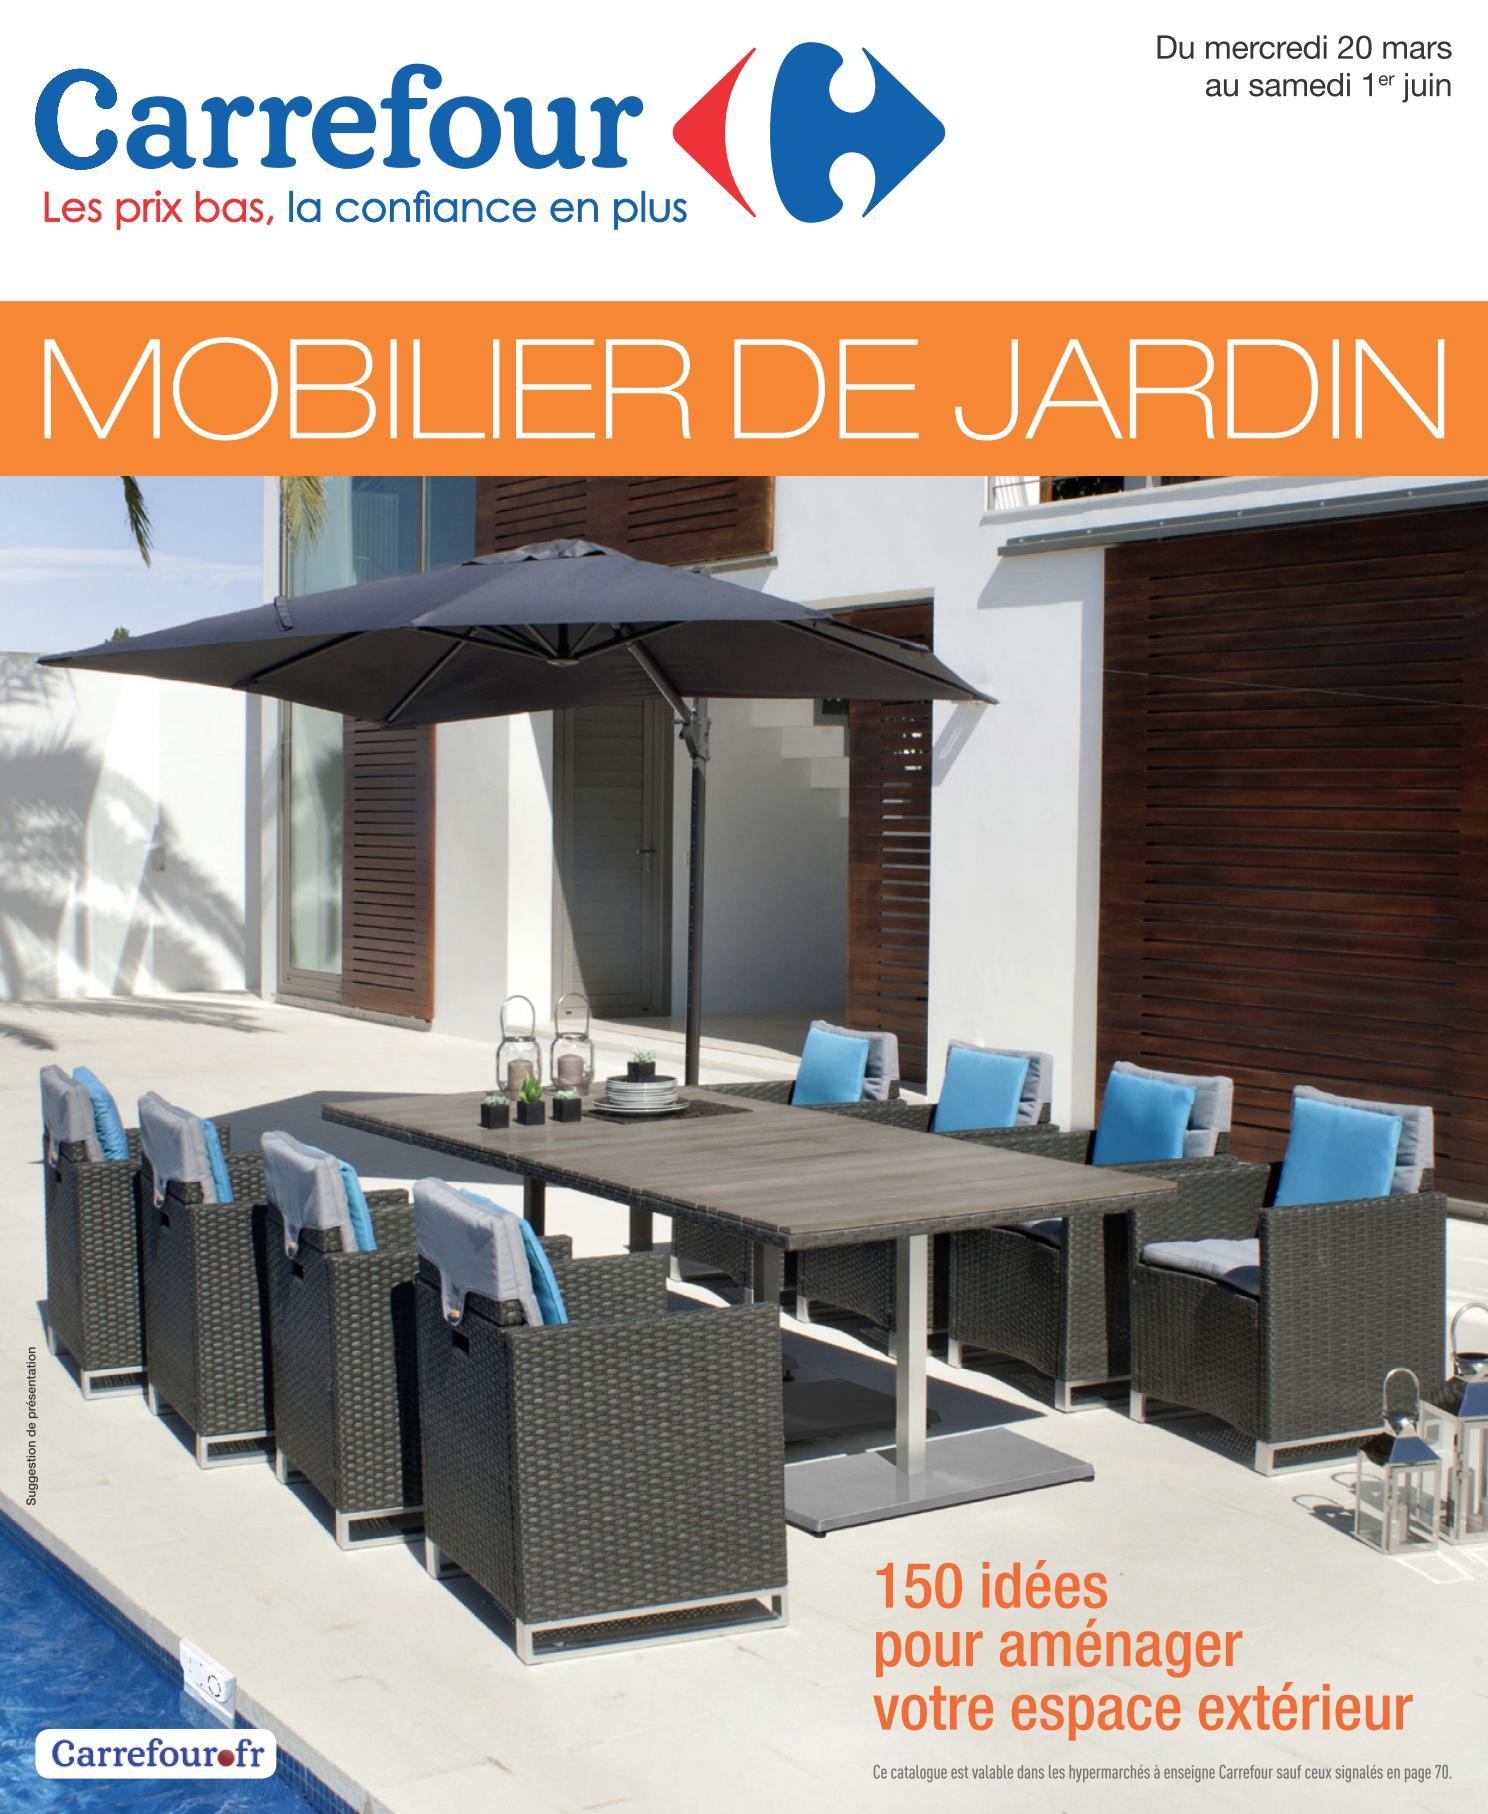 Salon De Jardin A Carrefour - The Best Undercut Ponytail destiné Salon De Jardin Weldom